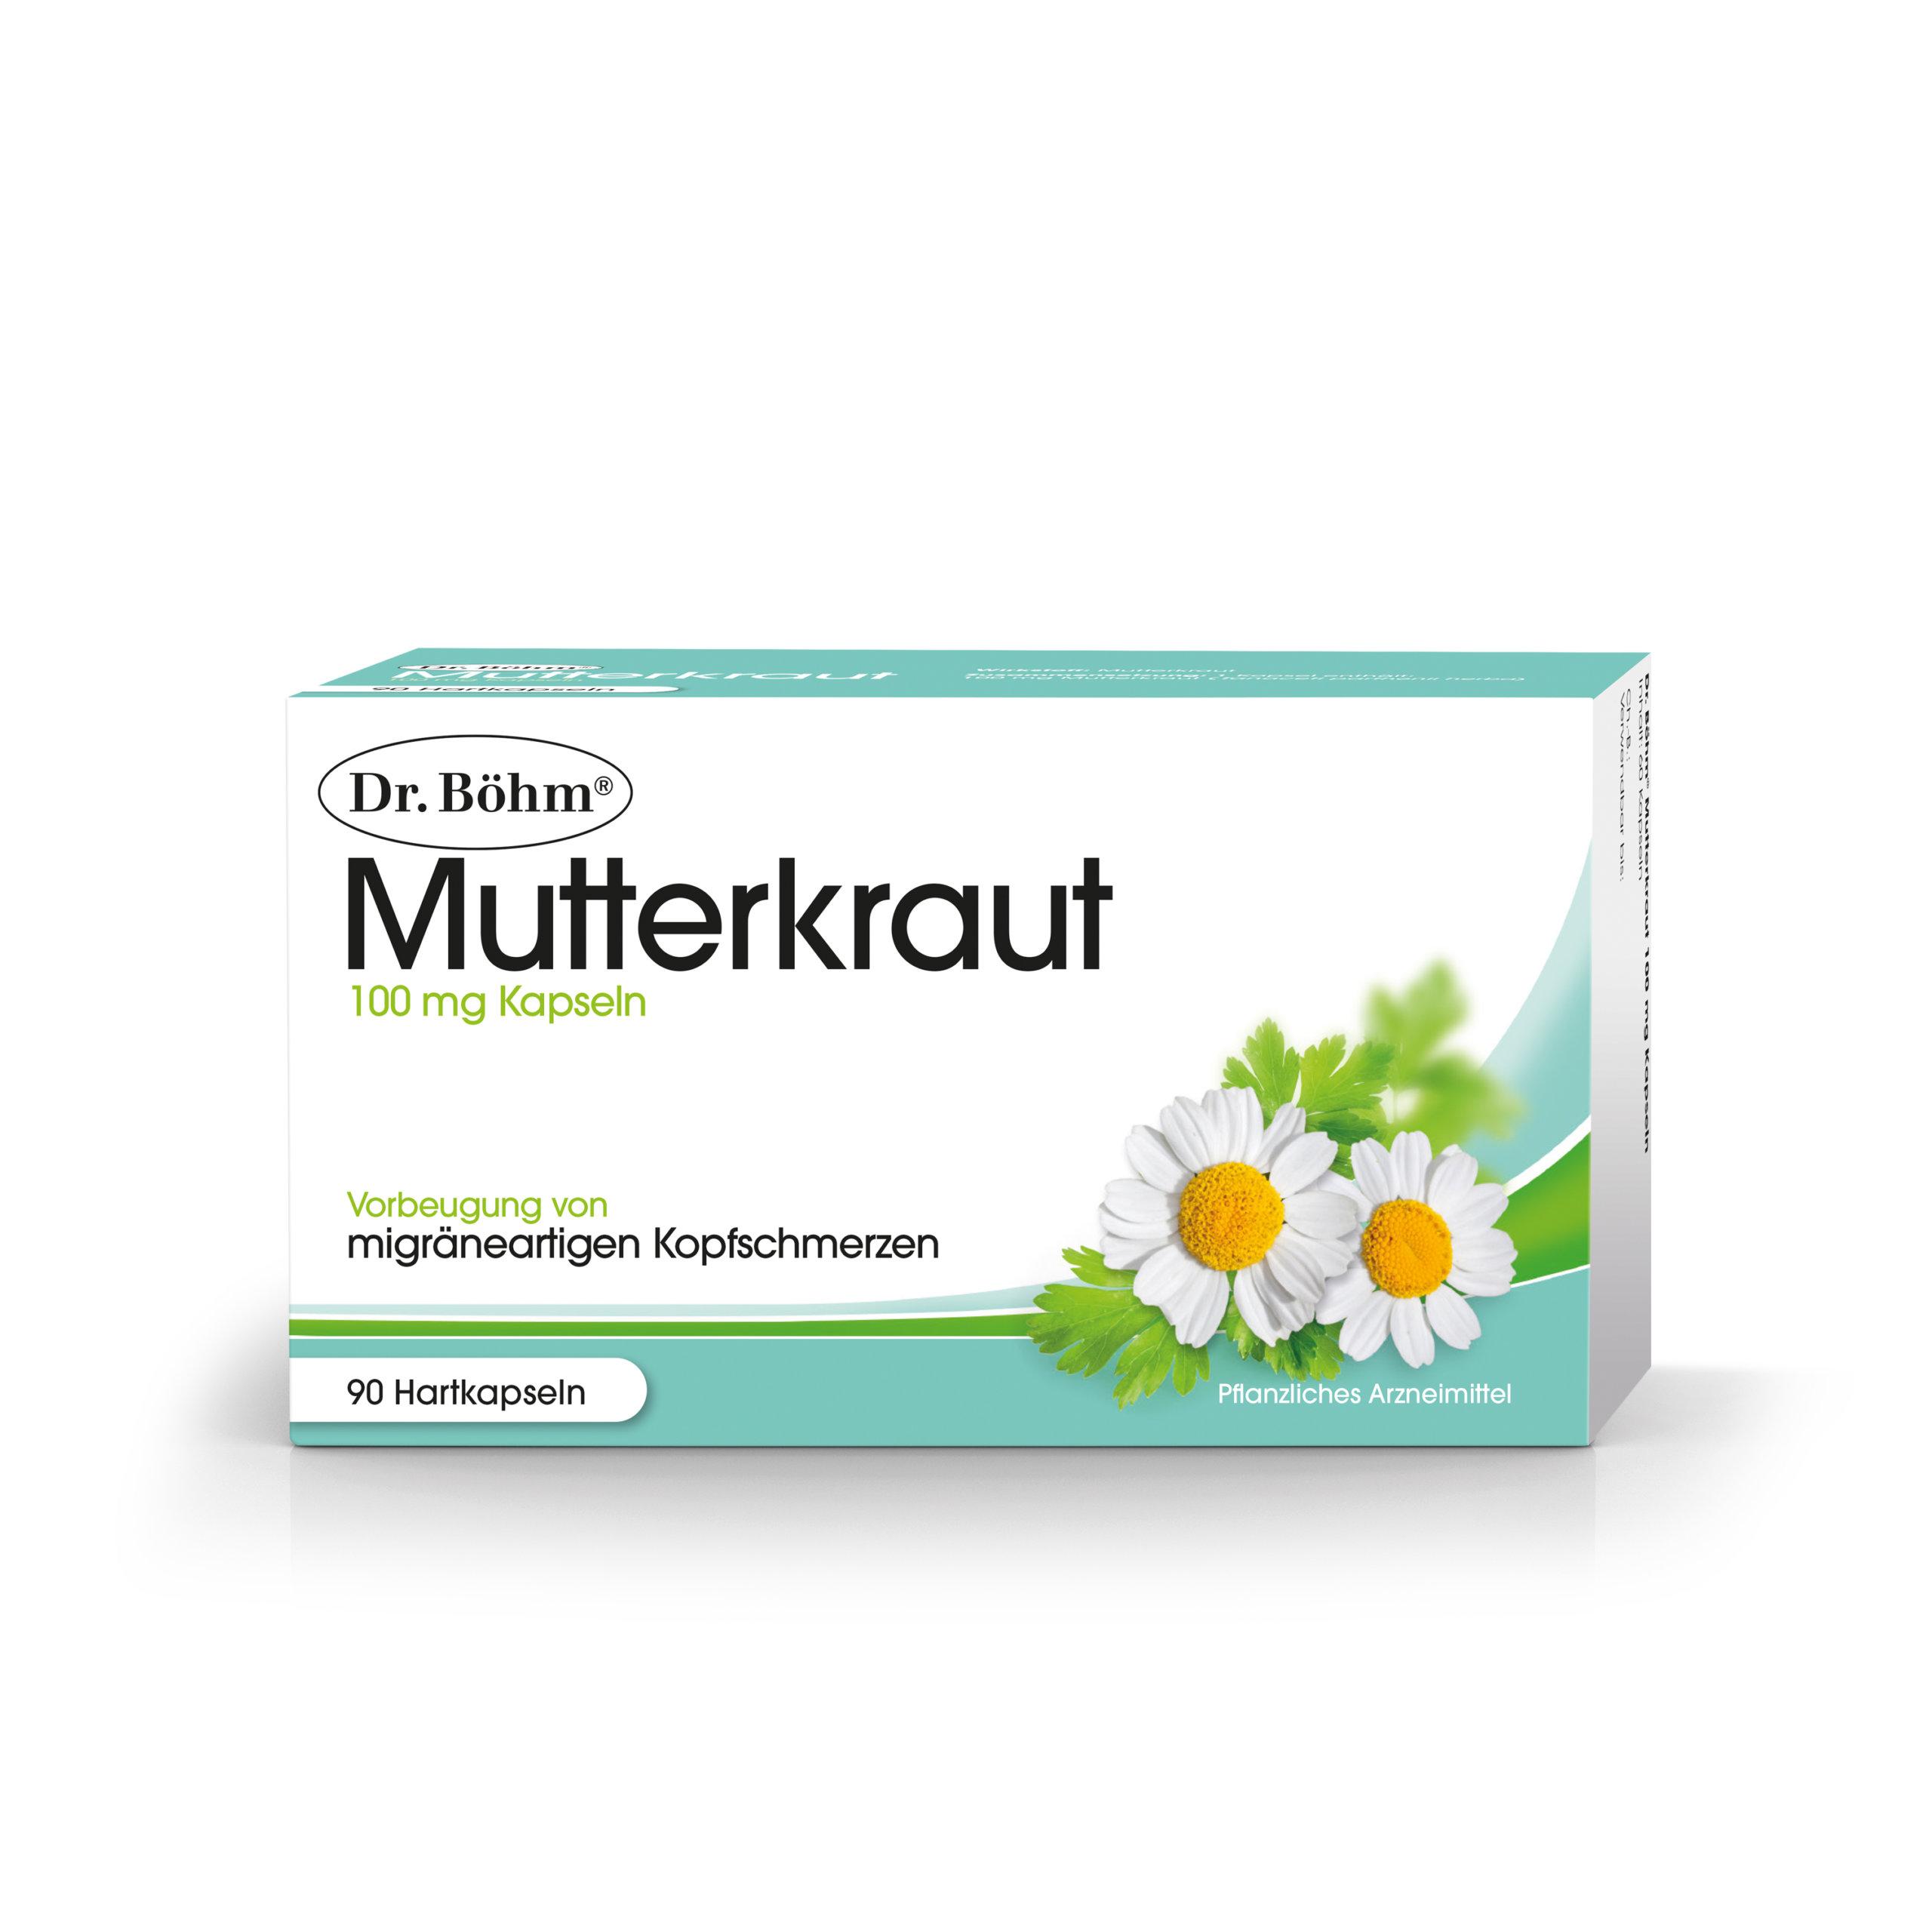 Dr. Böhm® Mutterkraut 100 mg Kapseln, Vorbeugung von migräneartigen Kopfschmerzen